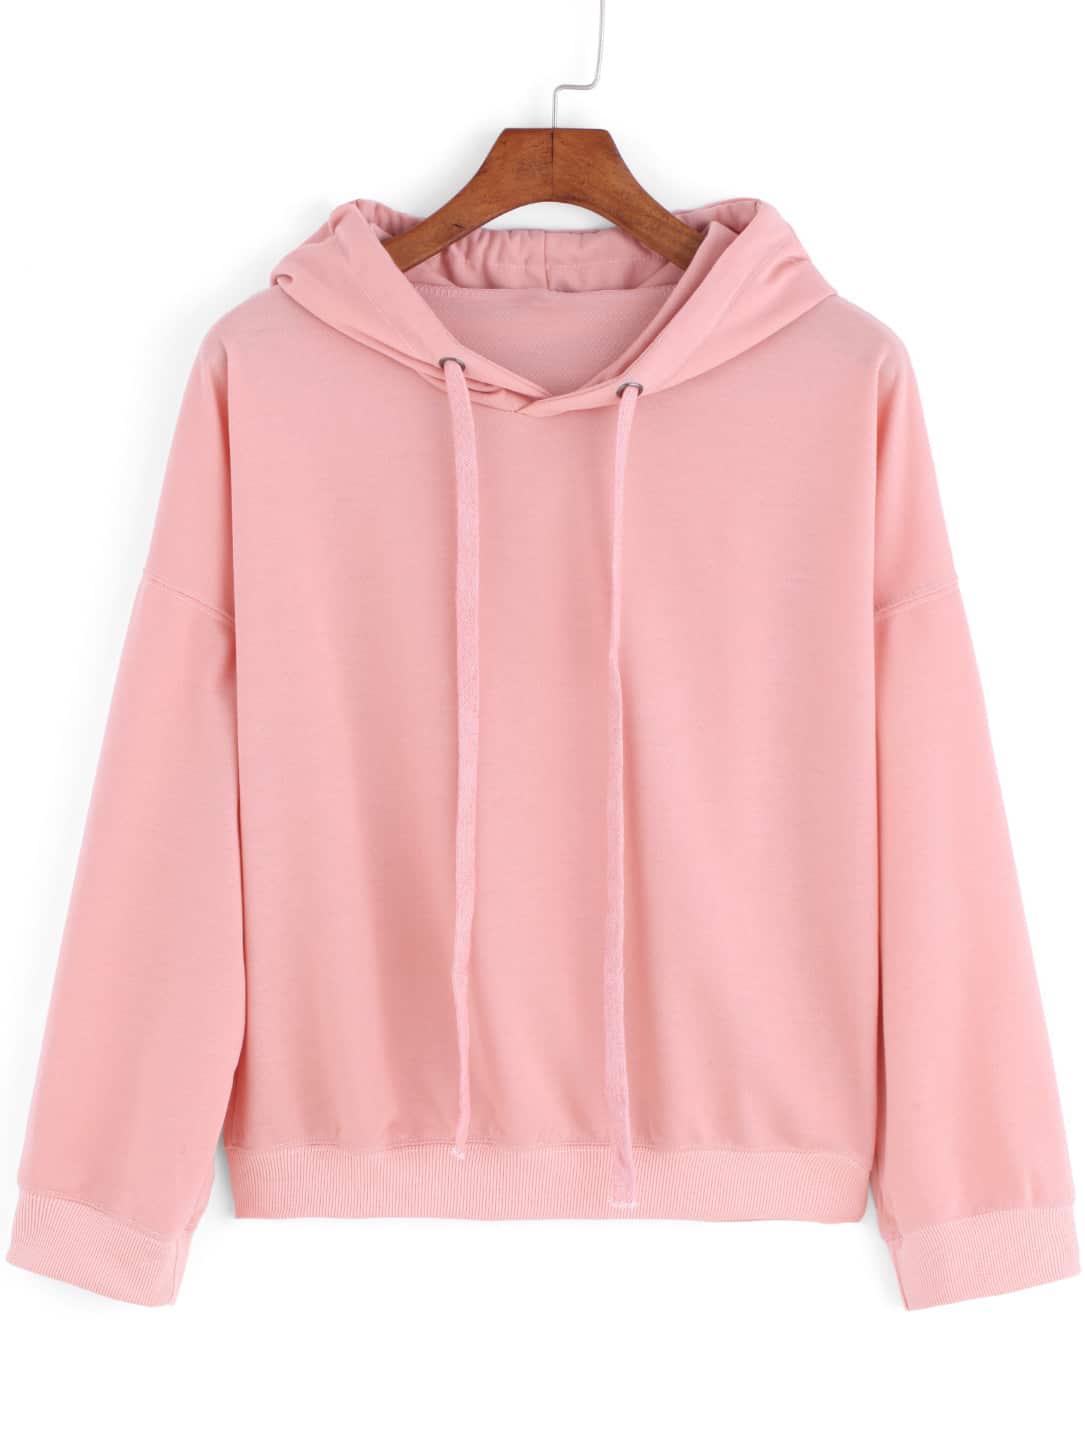 Pink Hooded Drawstring Loose Crop Sweatshirt -SheIn(Sheinside)